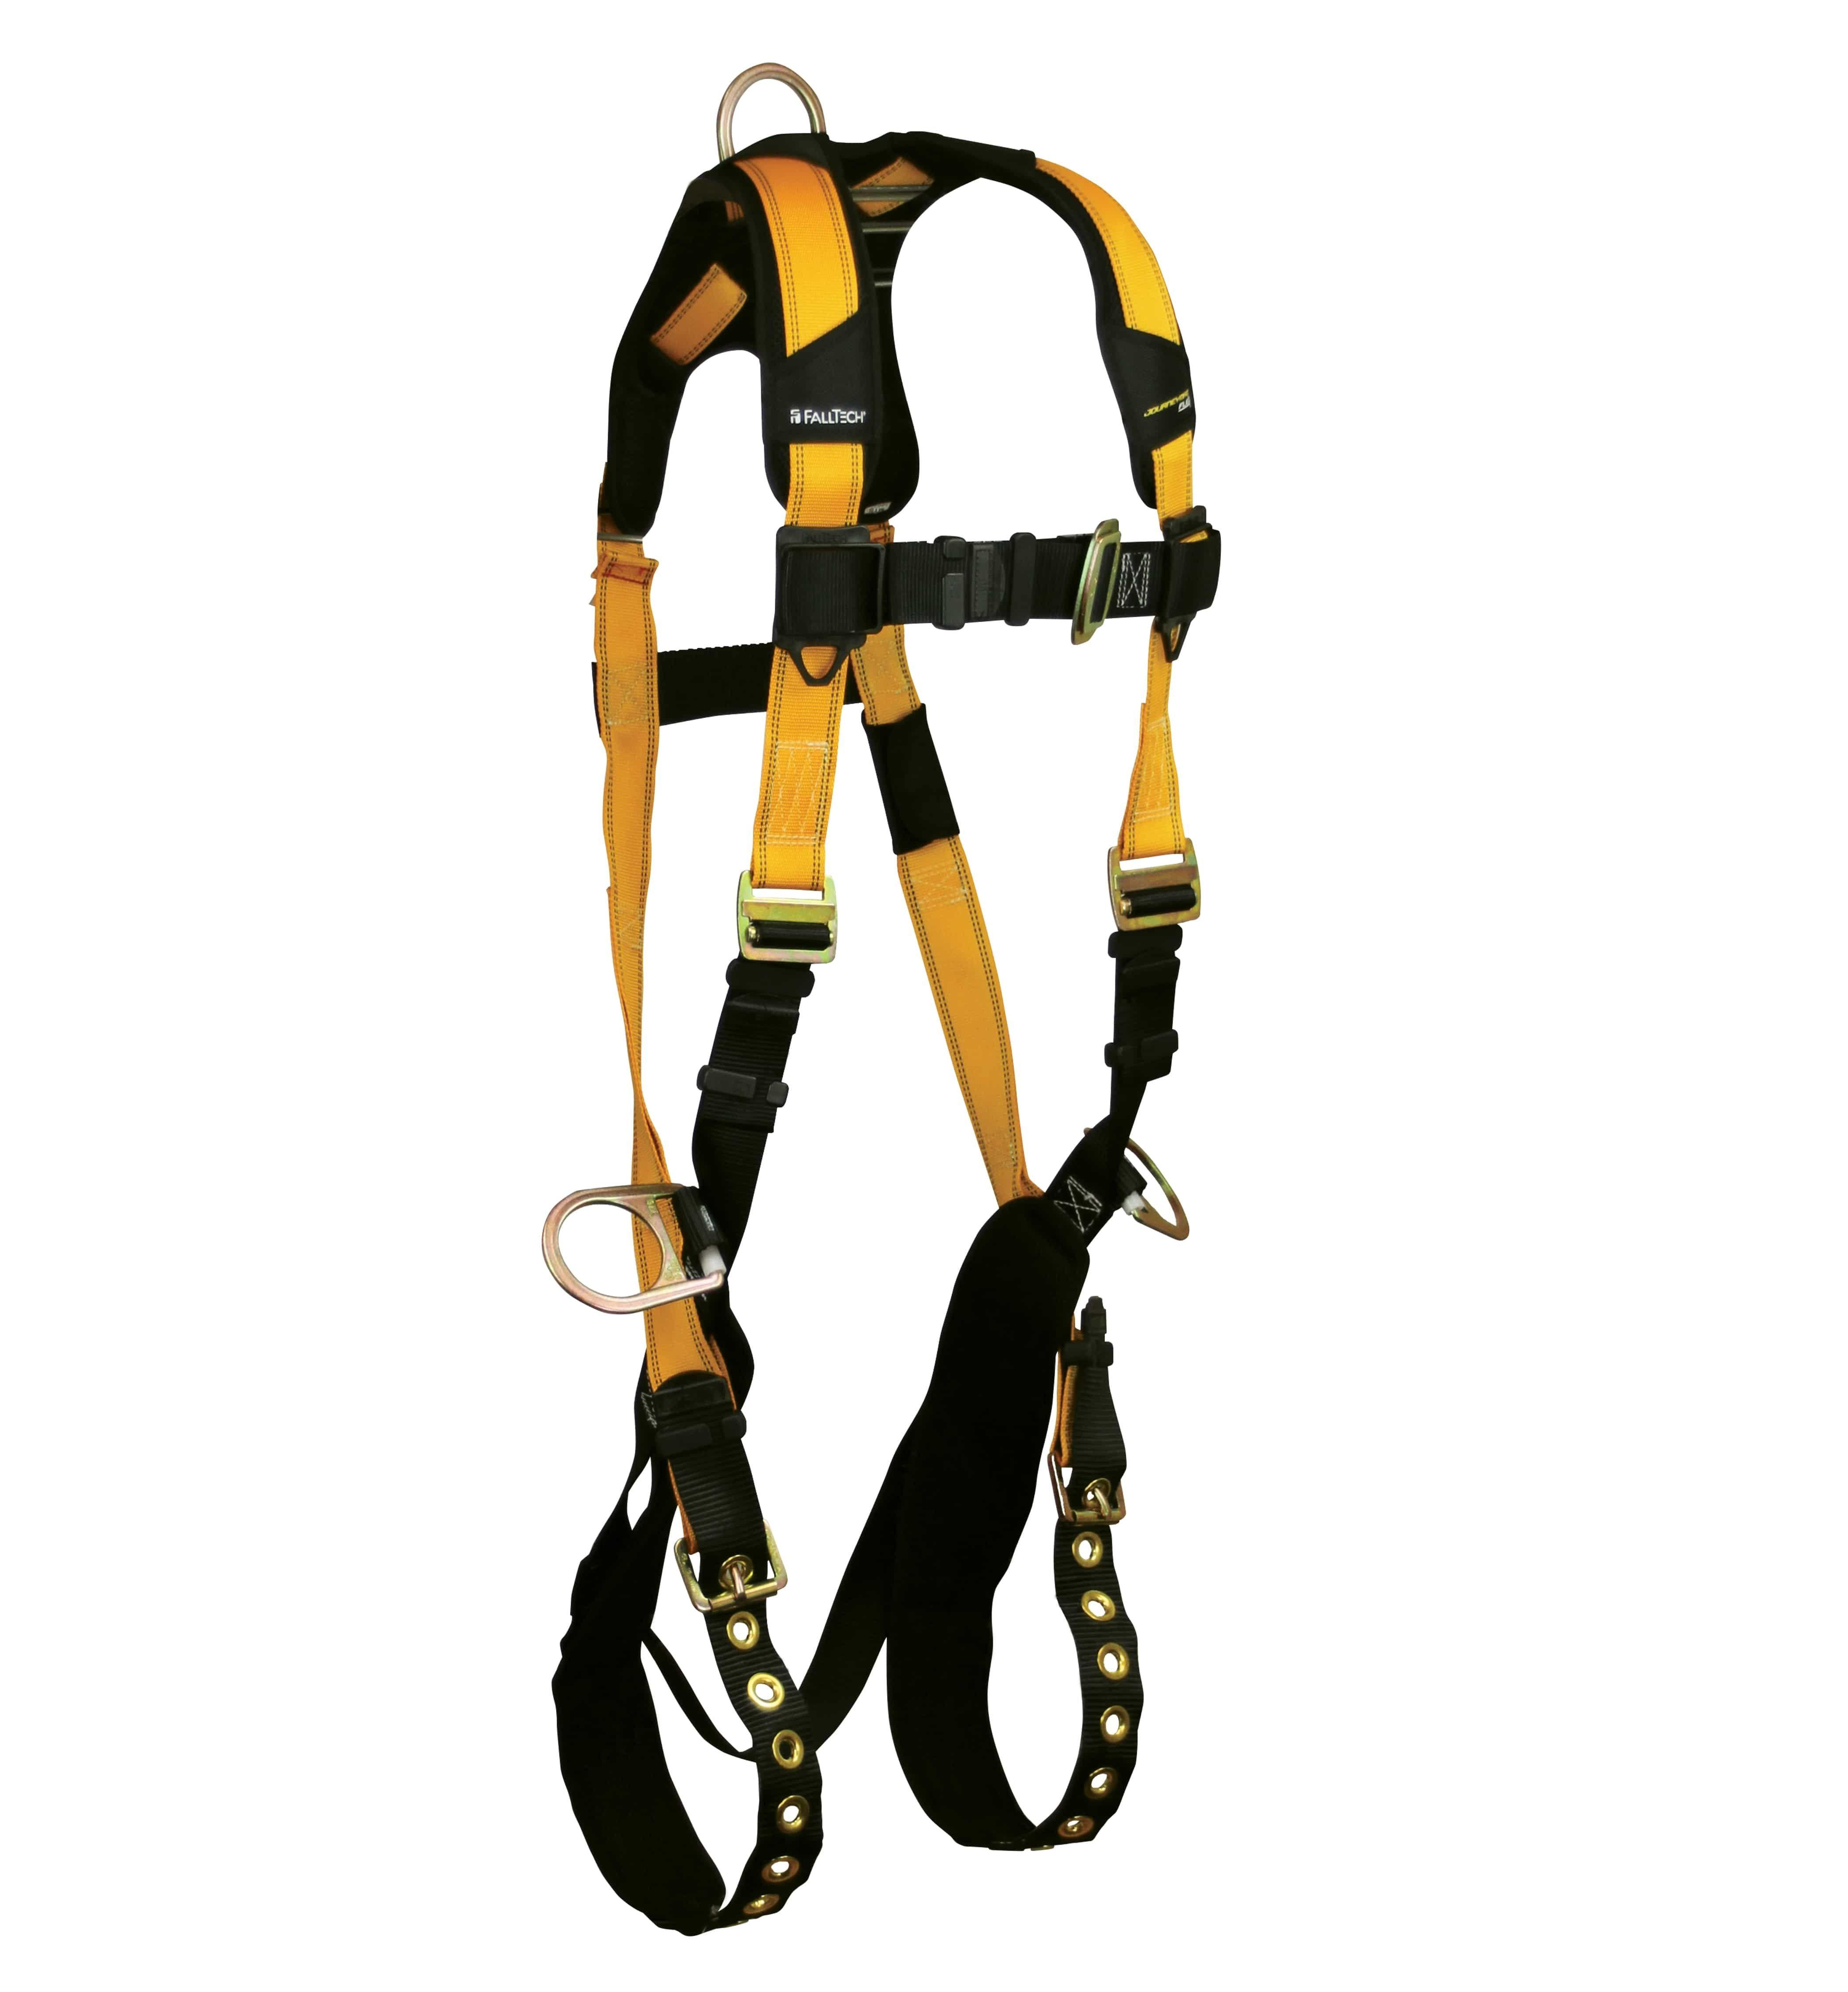 Journeyman FLEX Steel Harness #7023